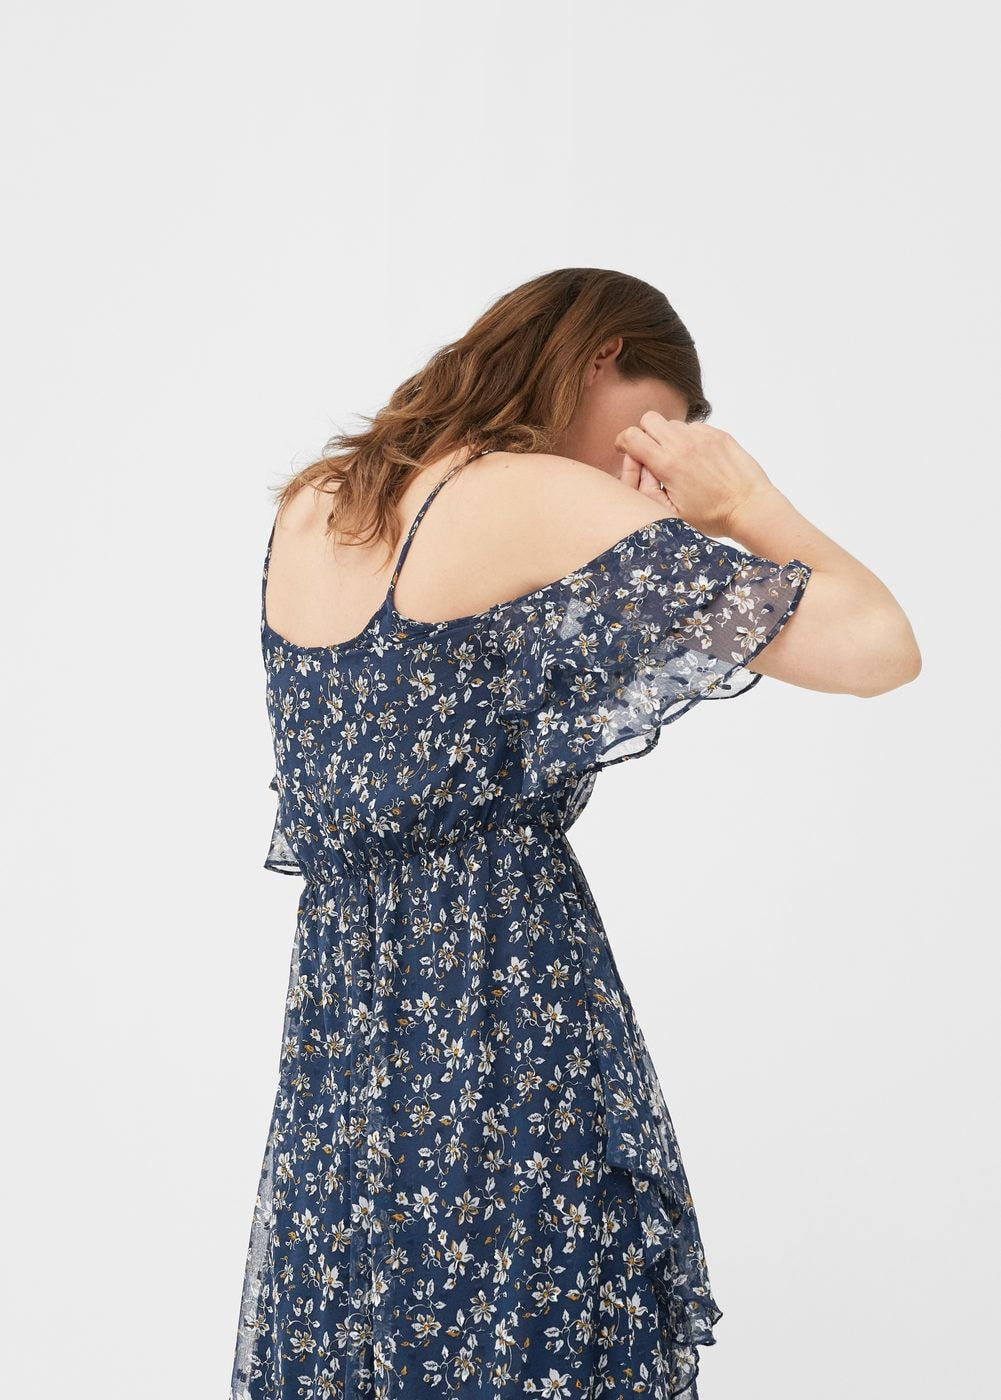 bb6e87846f89 Φόρεμα έξωμο εμπριμέ - Γυναίκα